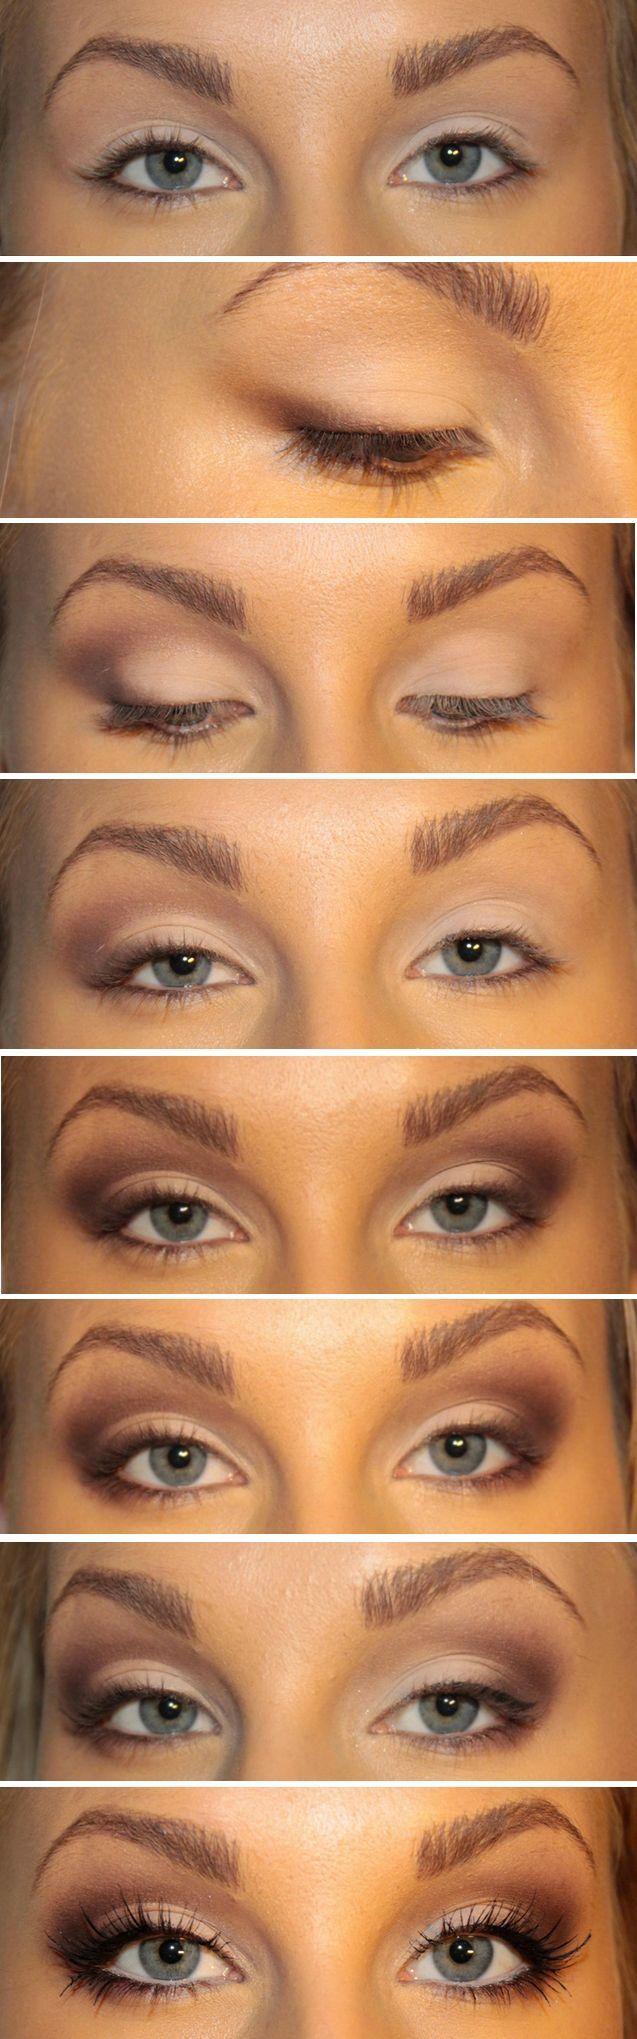 Makeup tutorial for big eyes